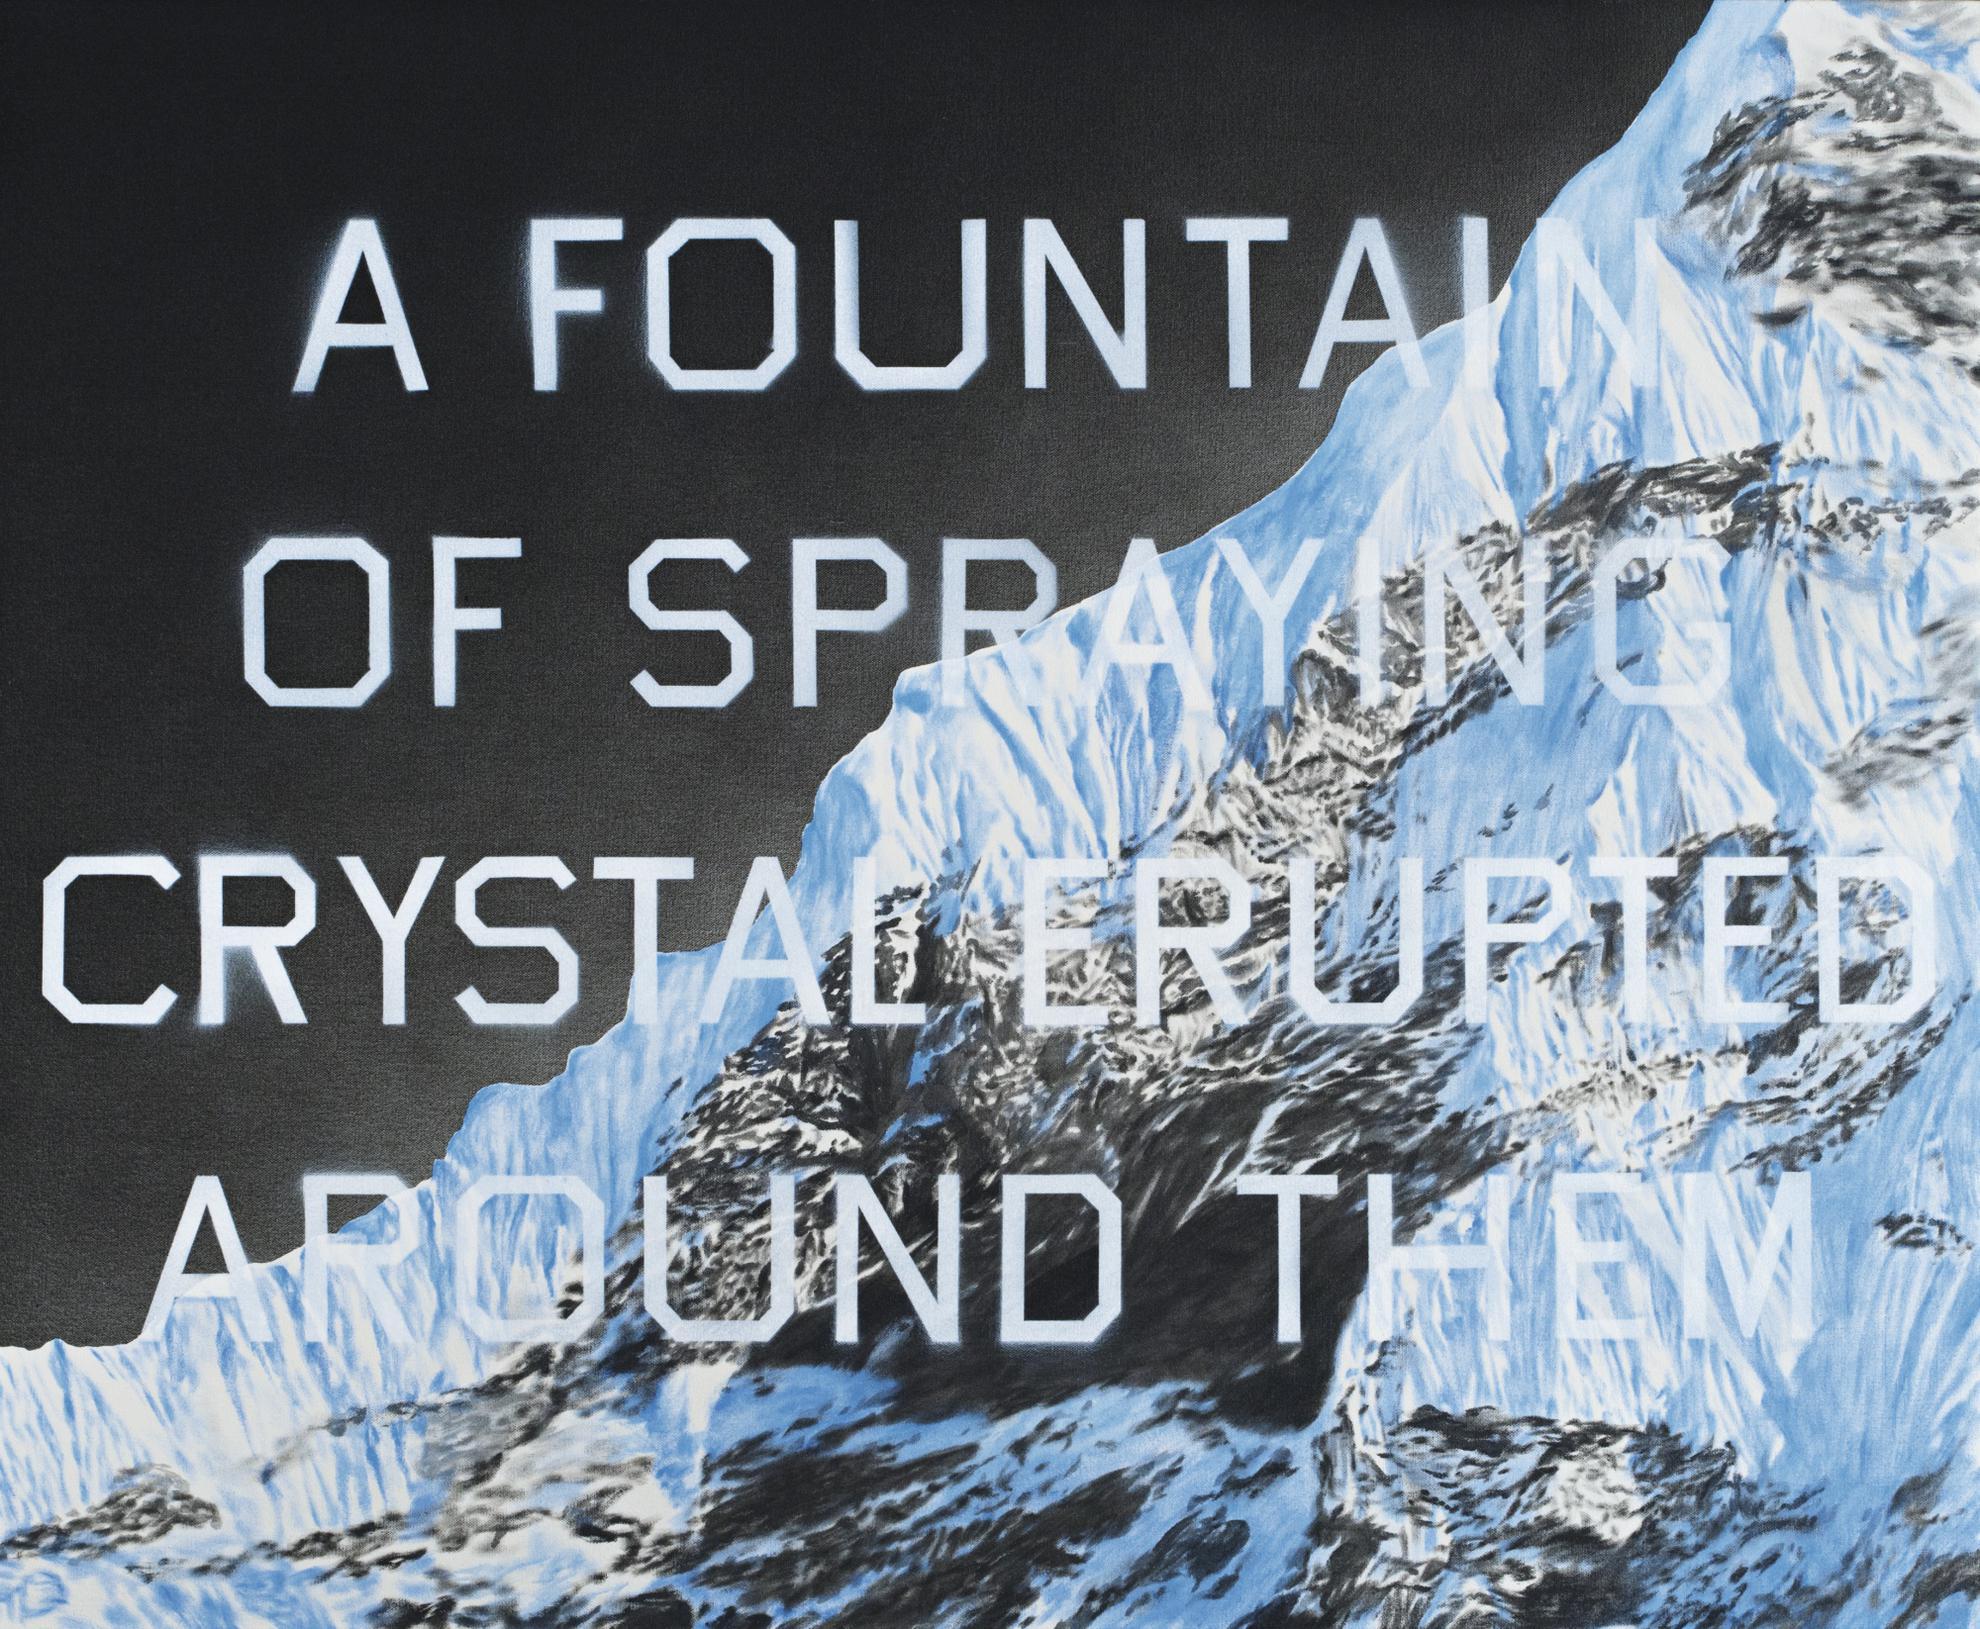 Ed Ruscha-Fountain Of Crystal-2009